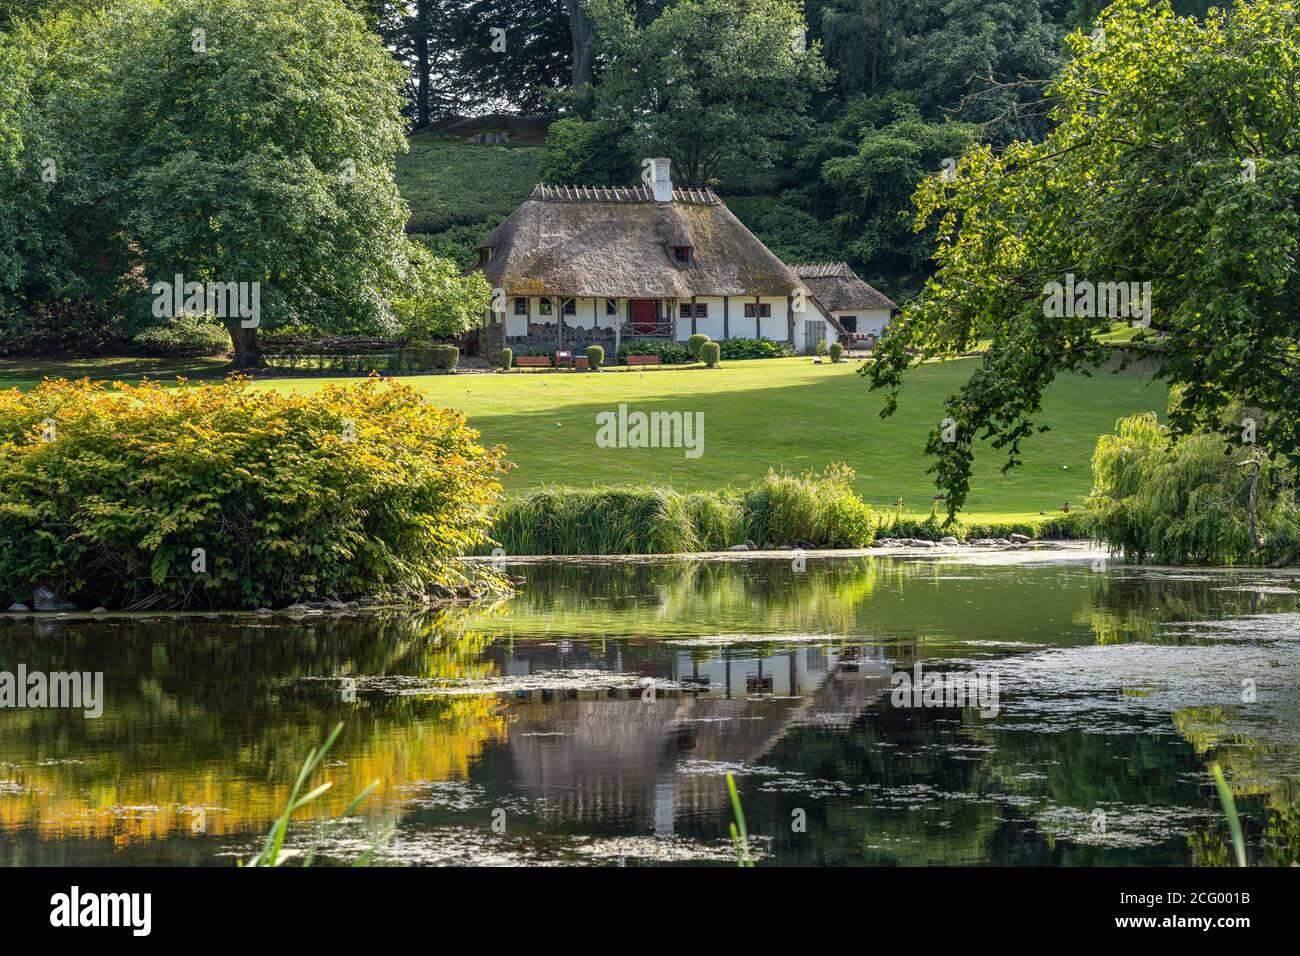 Landschaftsgarten High Resolution Stock Photography And Images Alamy